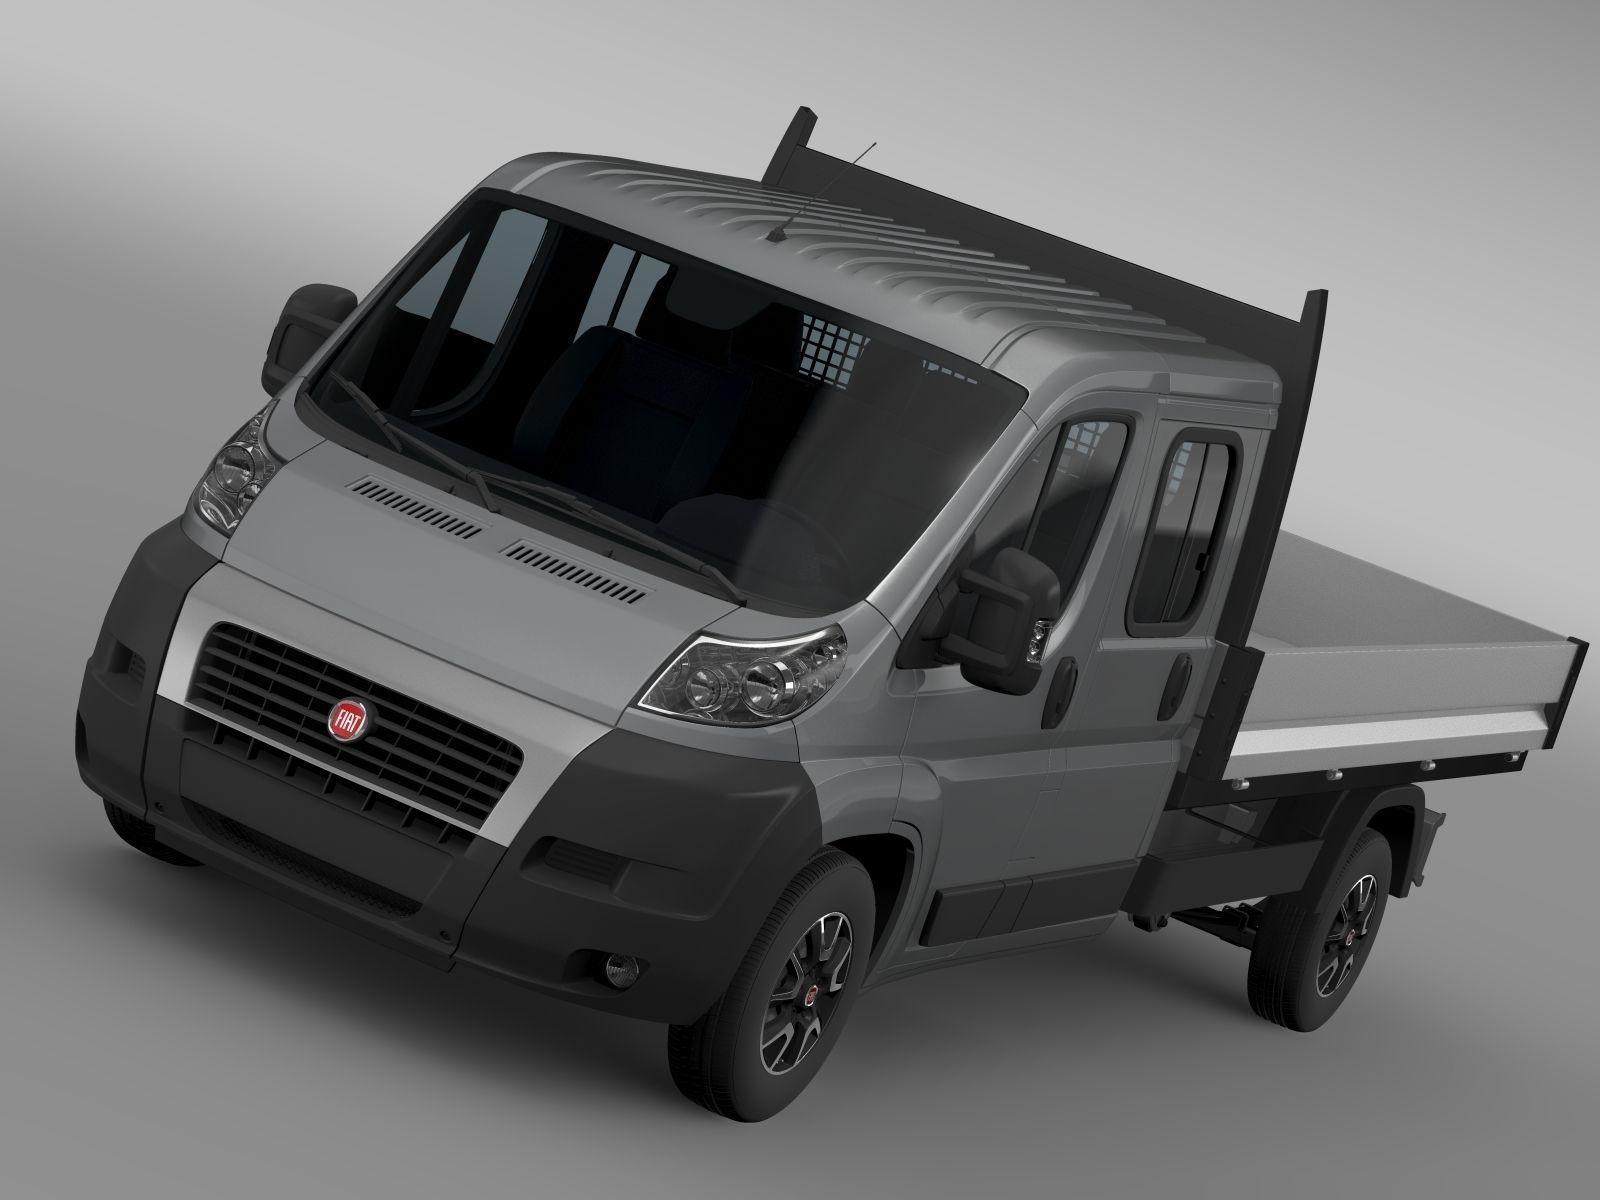 Fiat Ducato Crew Cab Truck 2009 2014